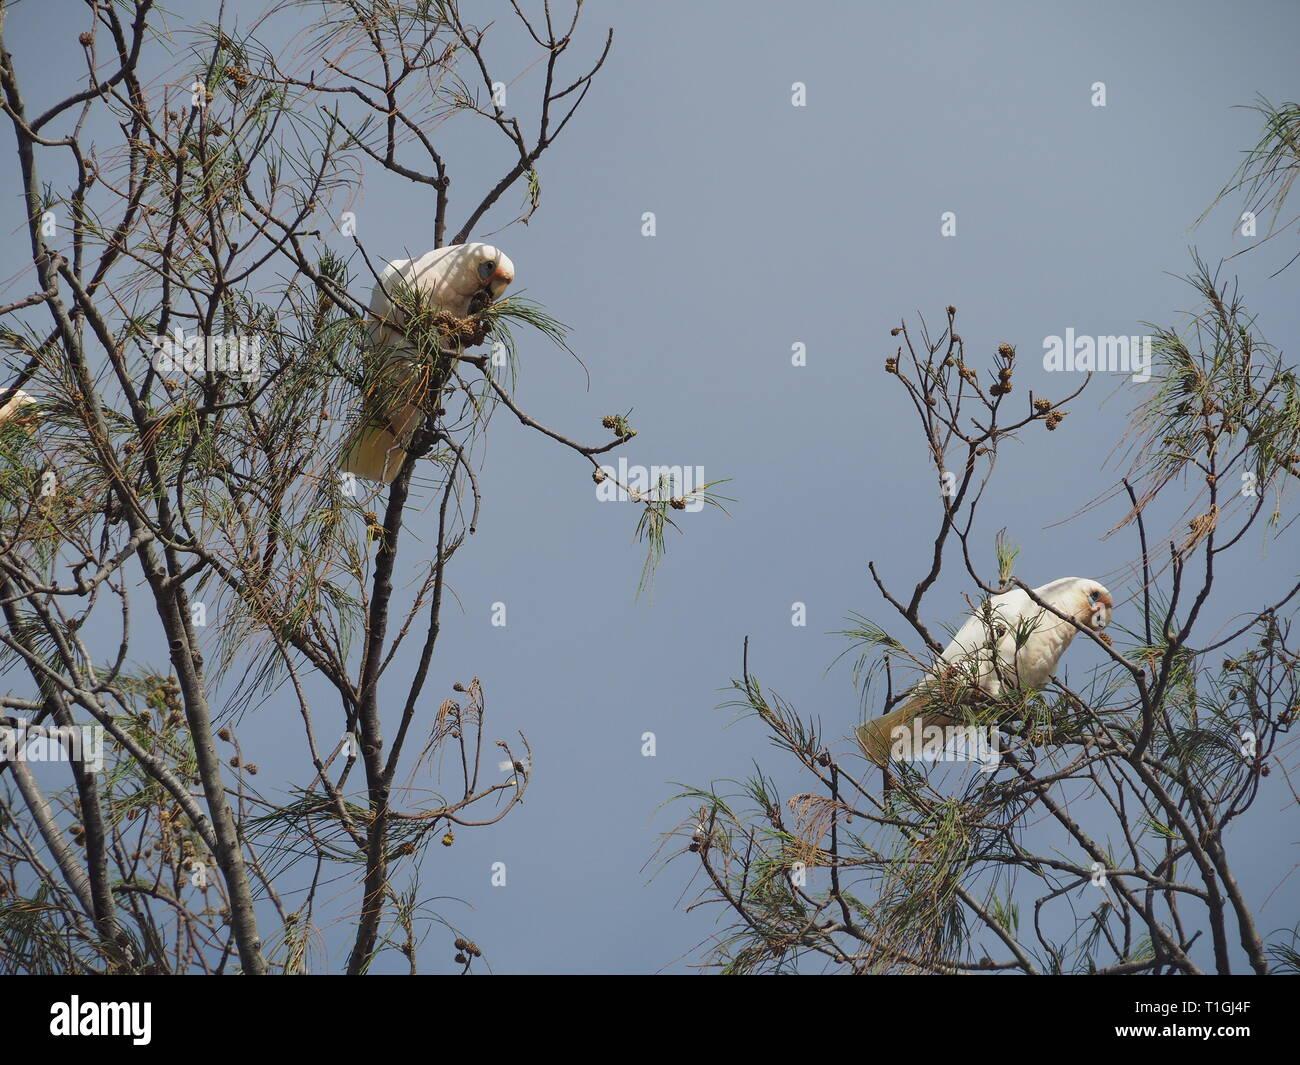 Australian Corellas in trees by the beach - Stock Image